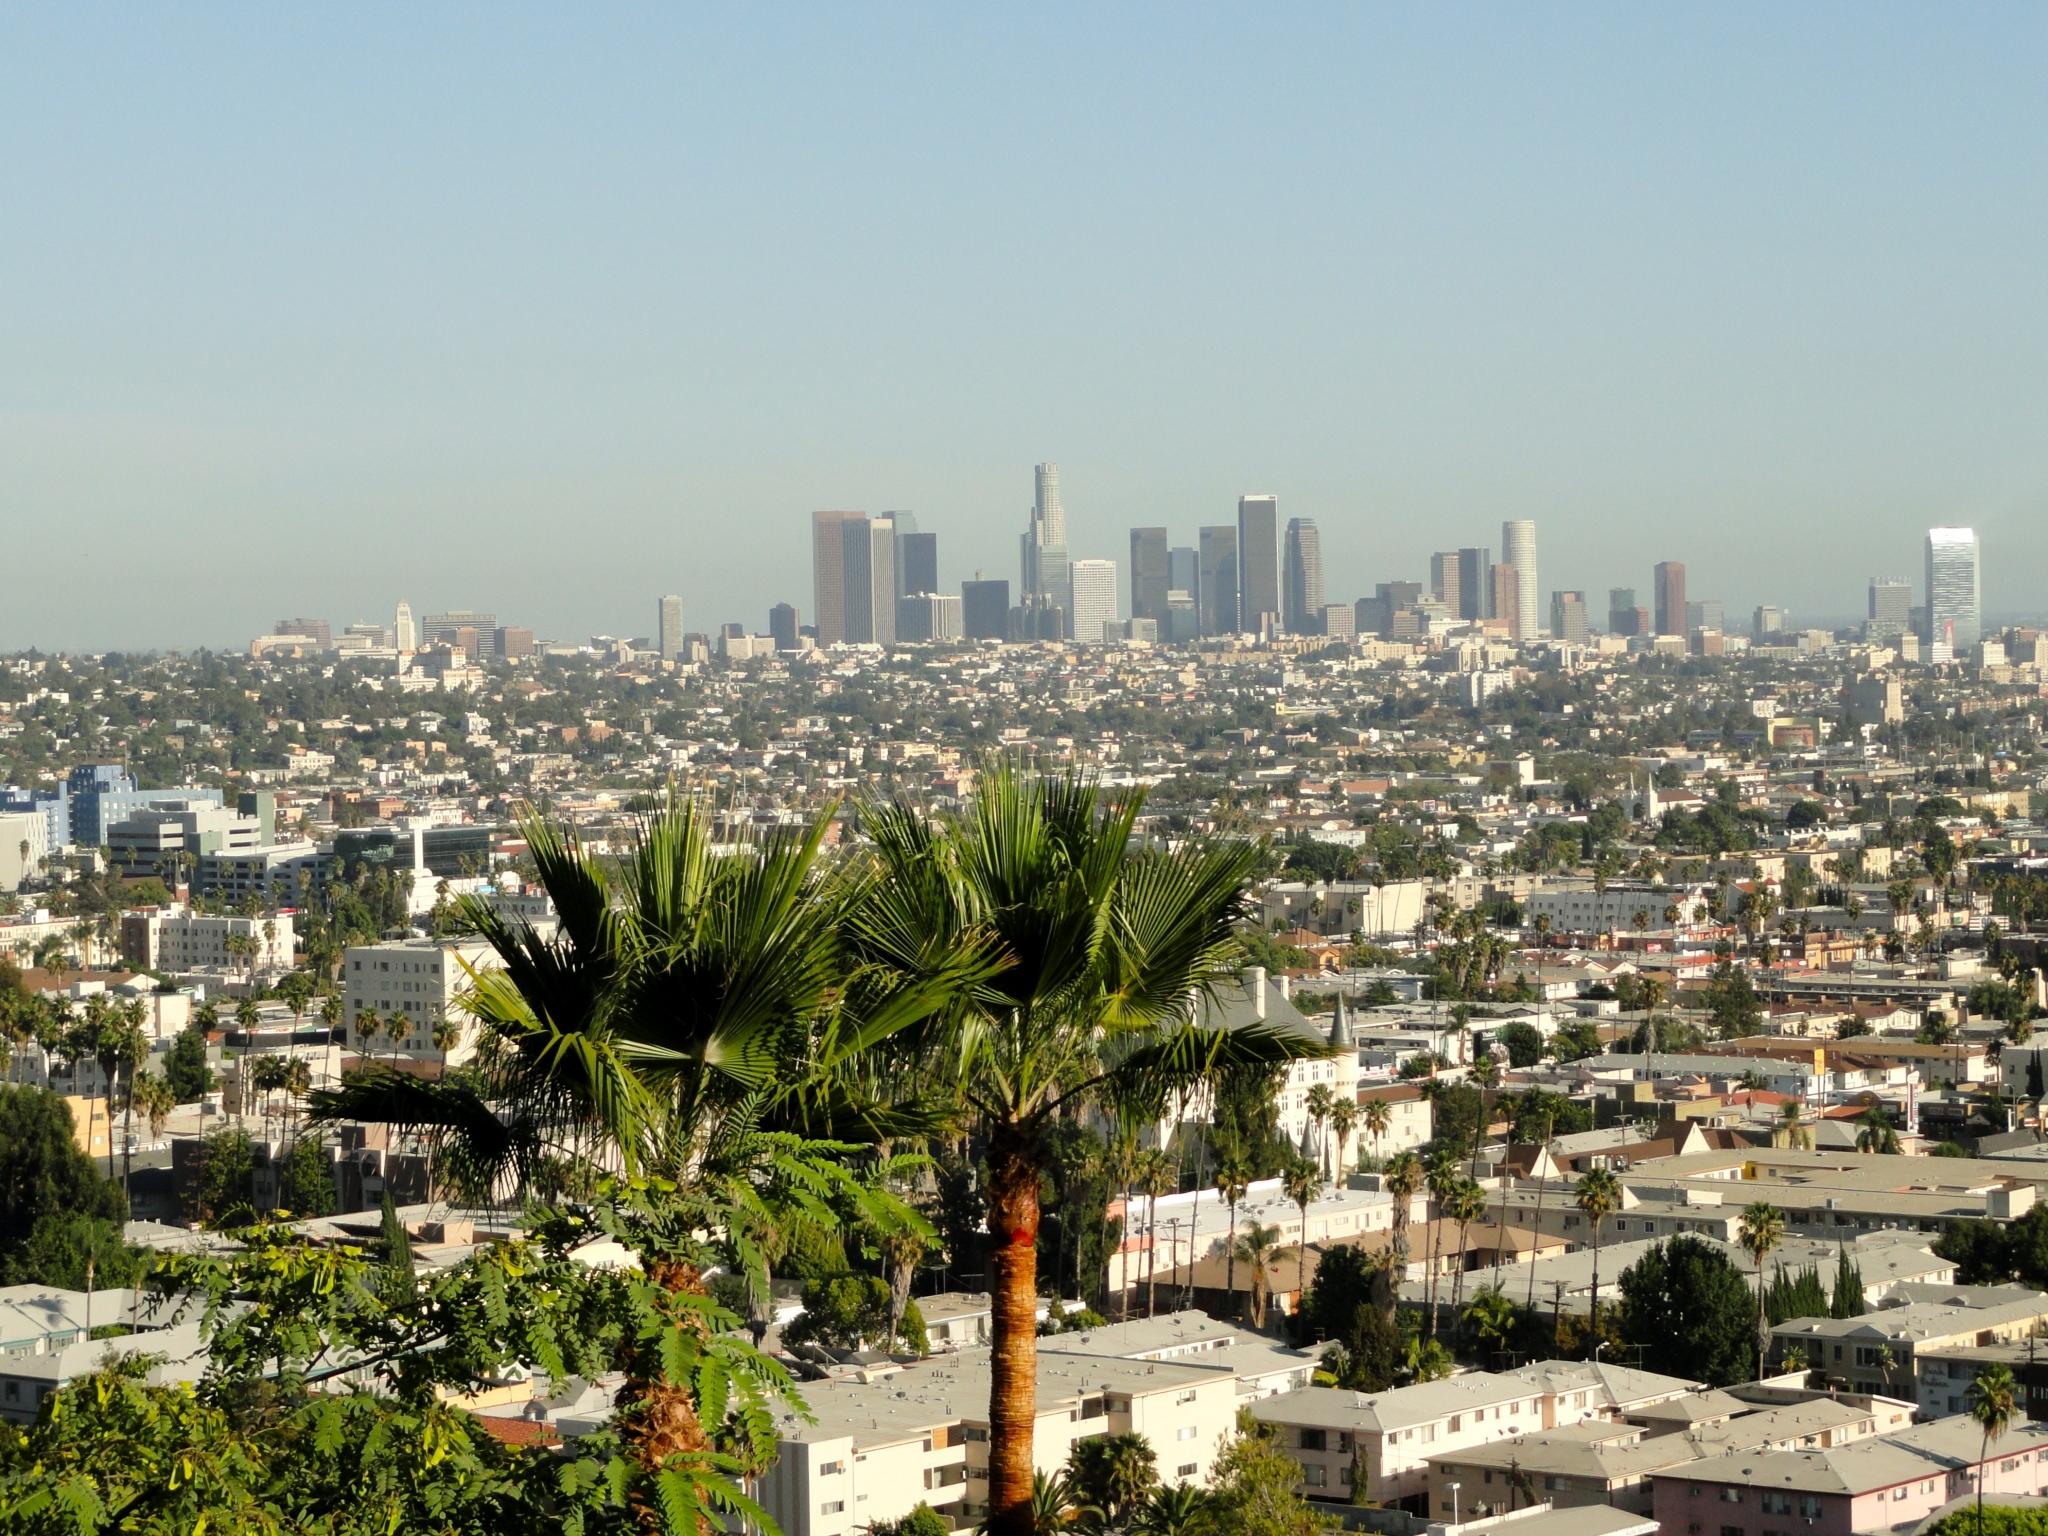 Голливуд - знаменитый район в лос-анджелесе (калифорния, сша) | hollywood - paikea.ru